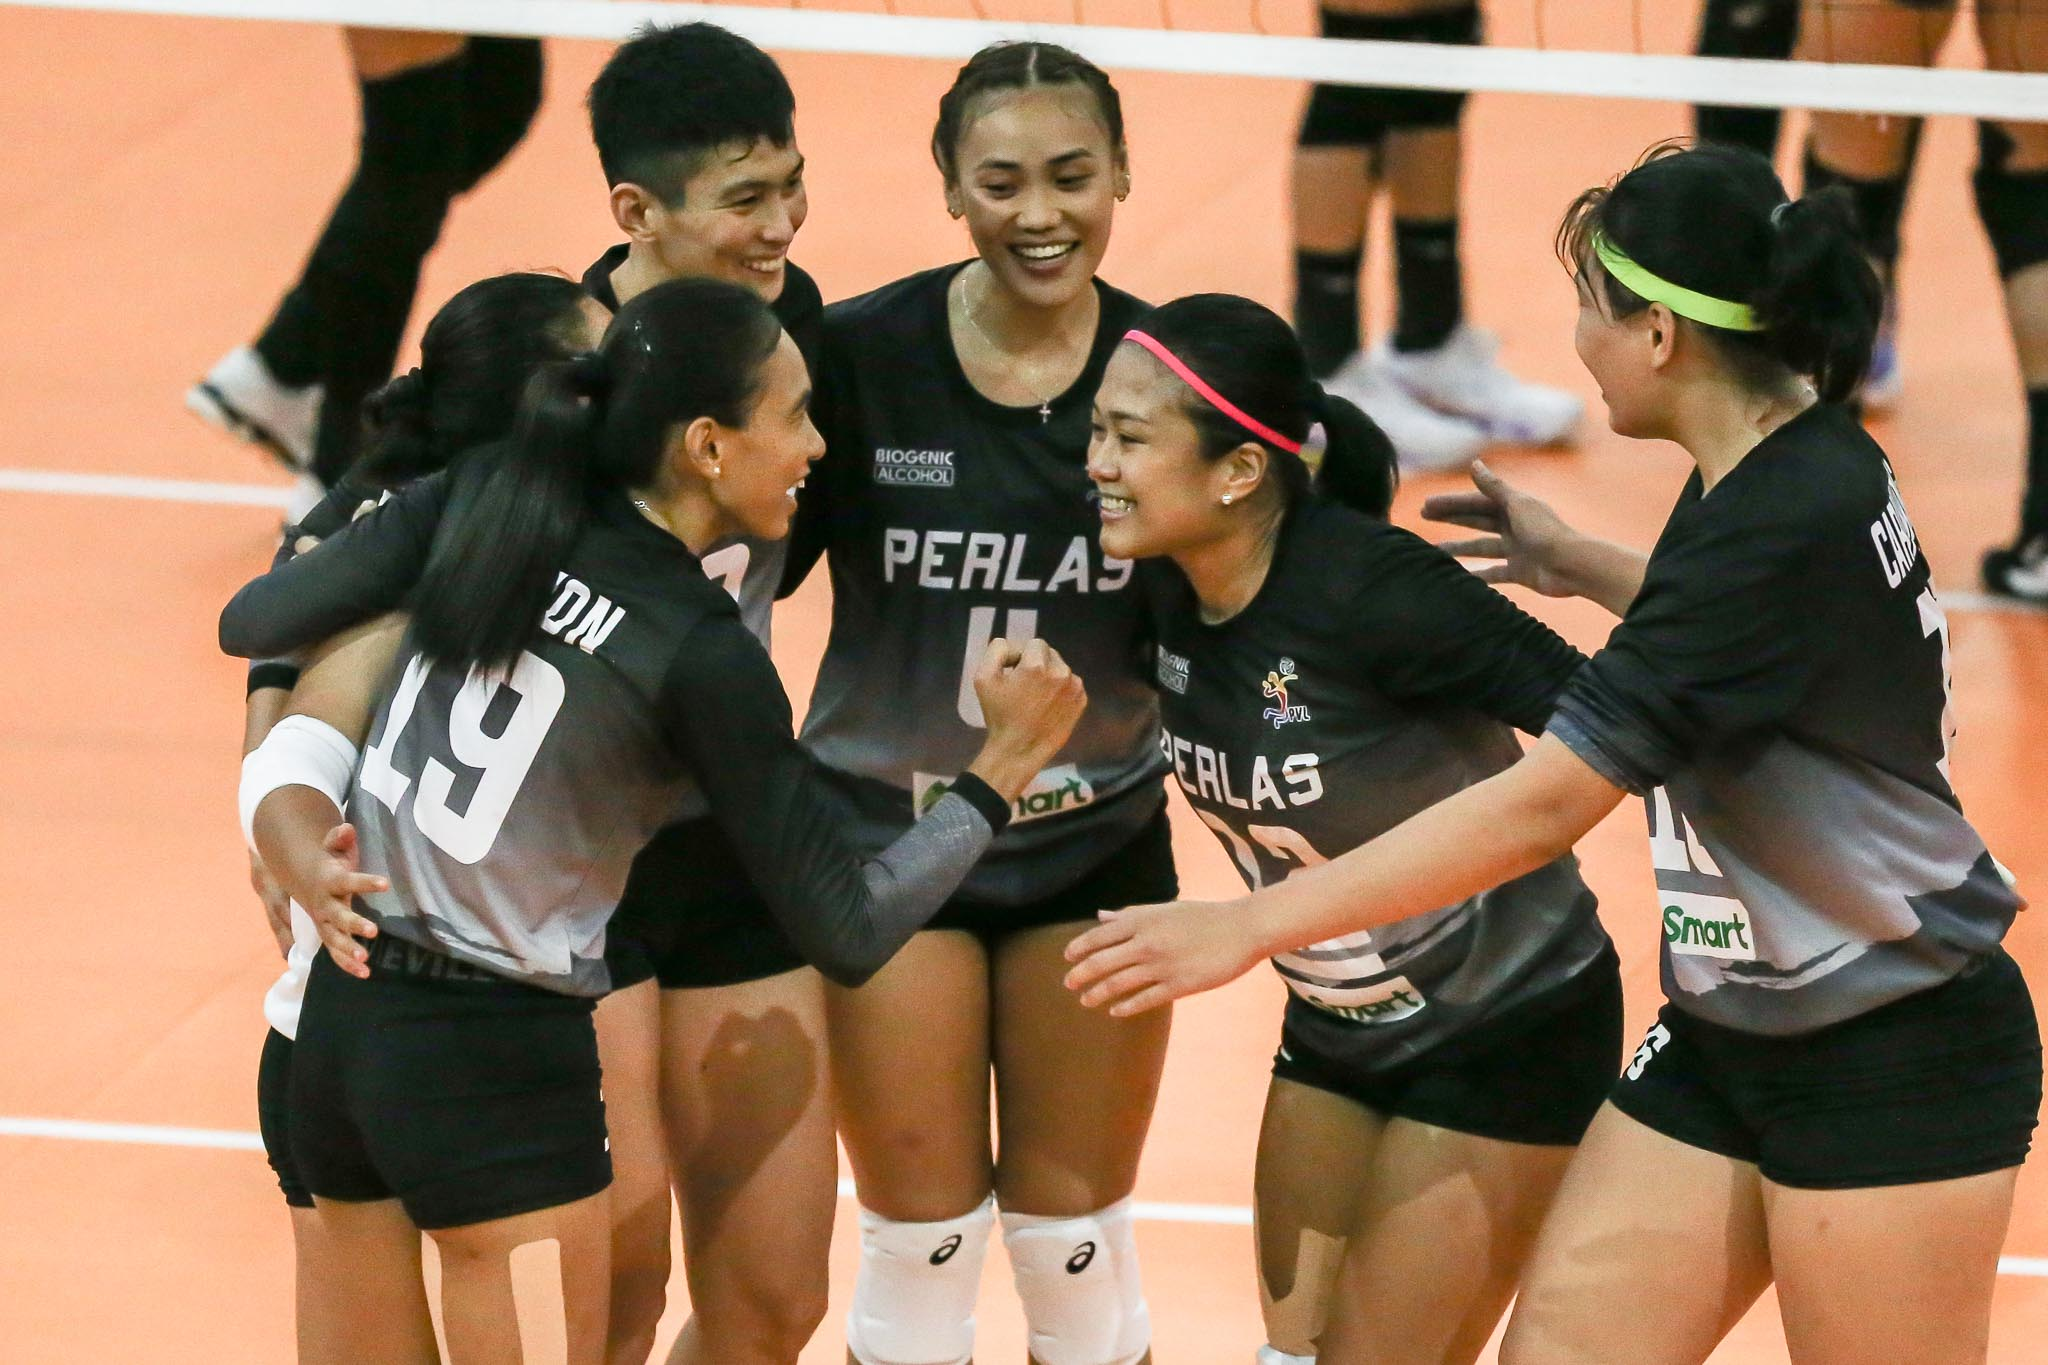 2021-PVL-Open-Perlas-vs-Choco-Mucho-Nicole-Tiamzon-x-Jellie-Tempiatura-x-Sue-Roces-x-Heather-Guino-o-x-Jem-Ferrer-x-Cza-Caranding Jem Ferrer vows Perlas will 'make their sacrifices worth it' News PVL Volleyball  - philippine sports news